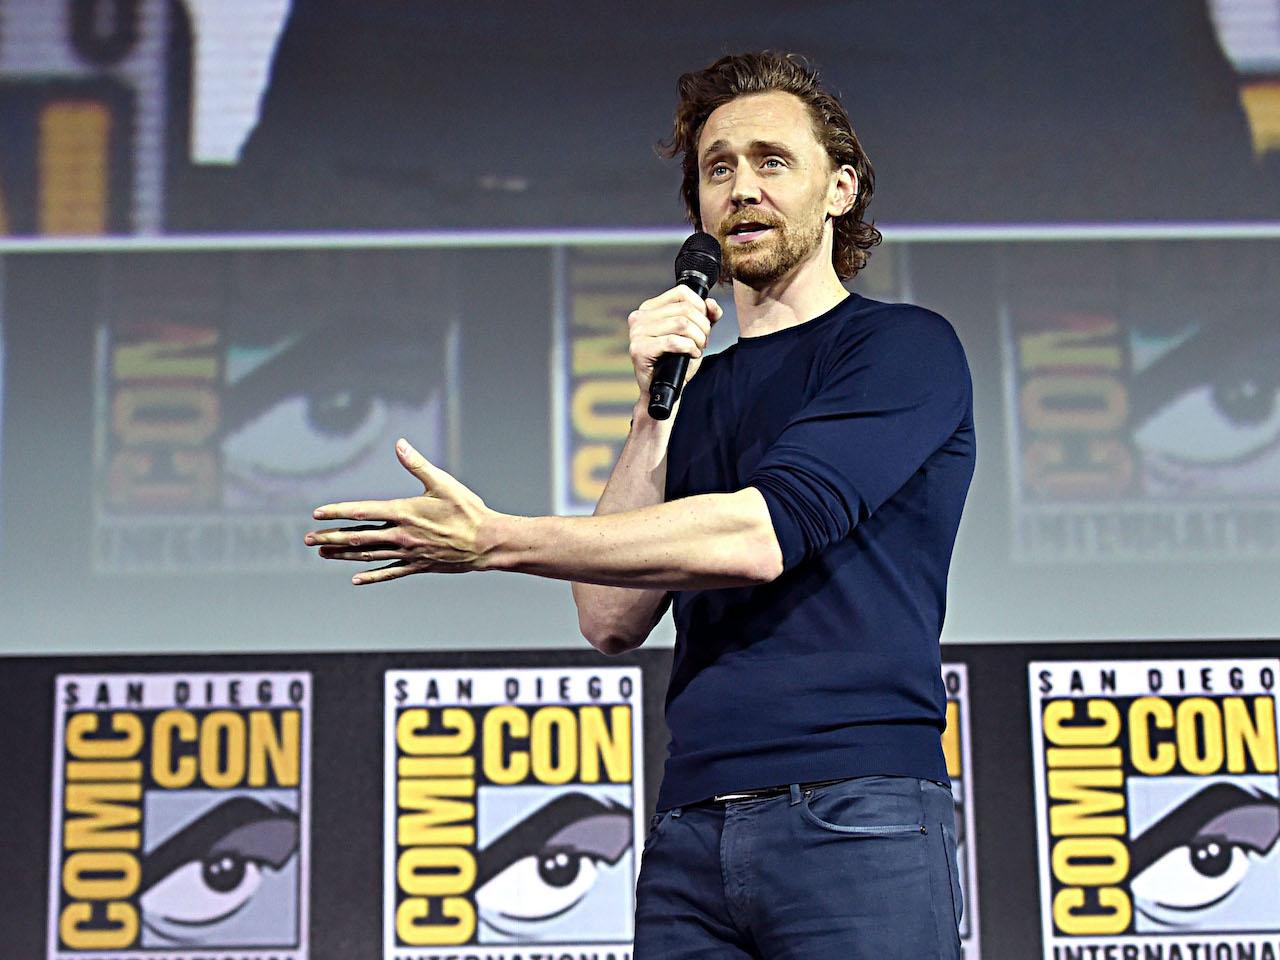 Tom Hiddleston of Marvel Studios' 'Loki' TV series at the San Diego Comic-Con International 2019 Marvel Studios Panel